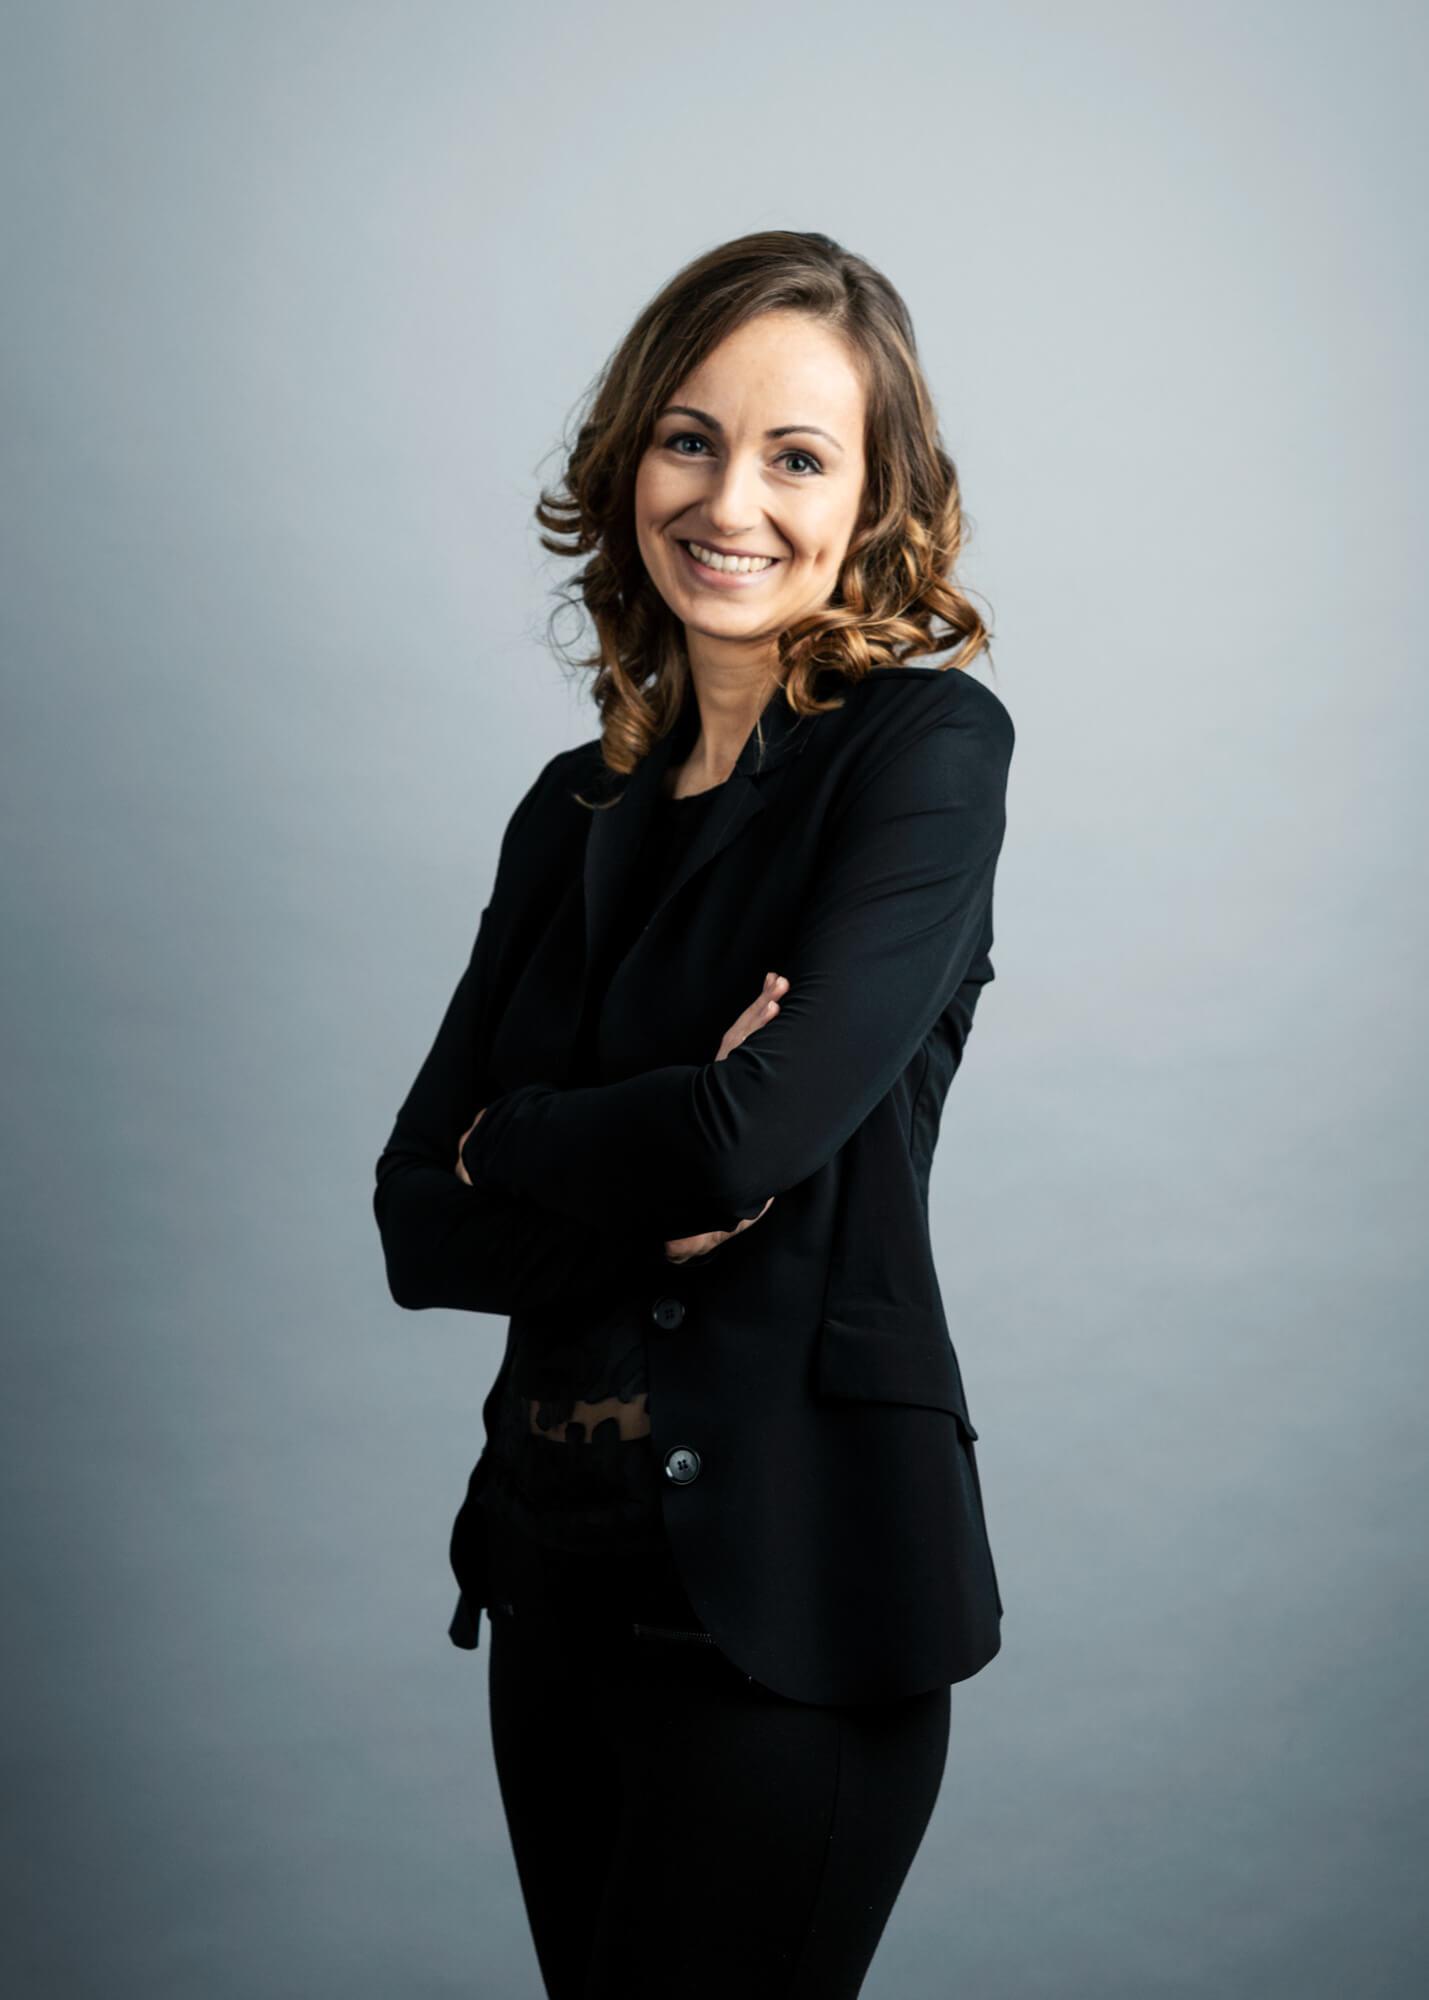 DI (FH) Elisabeth Schluga